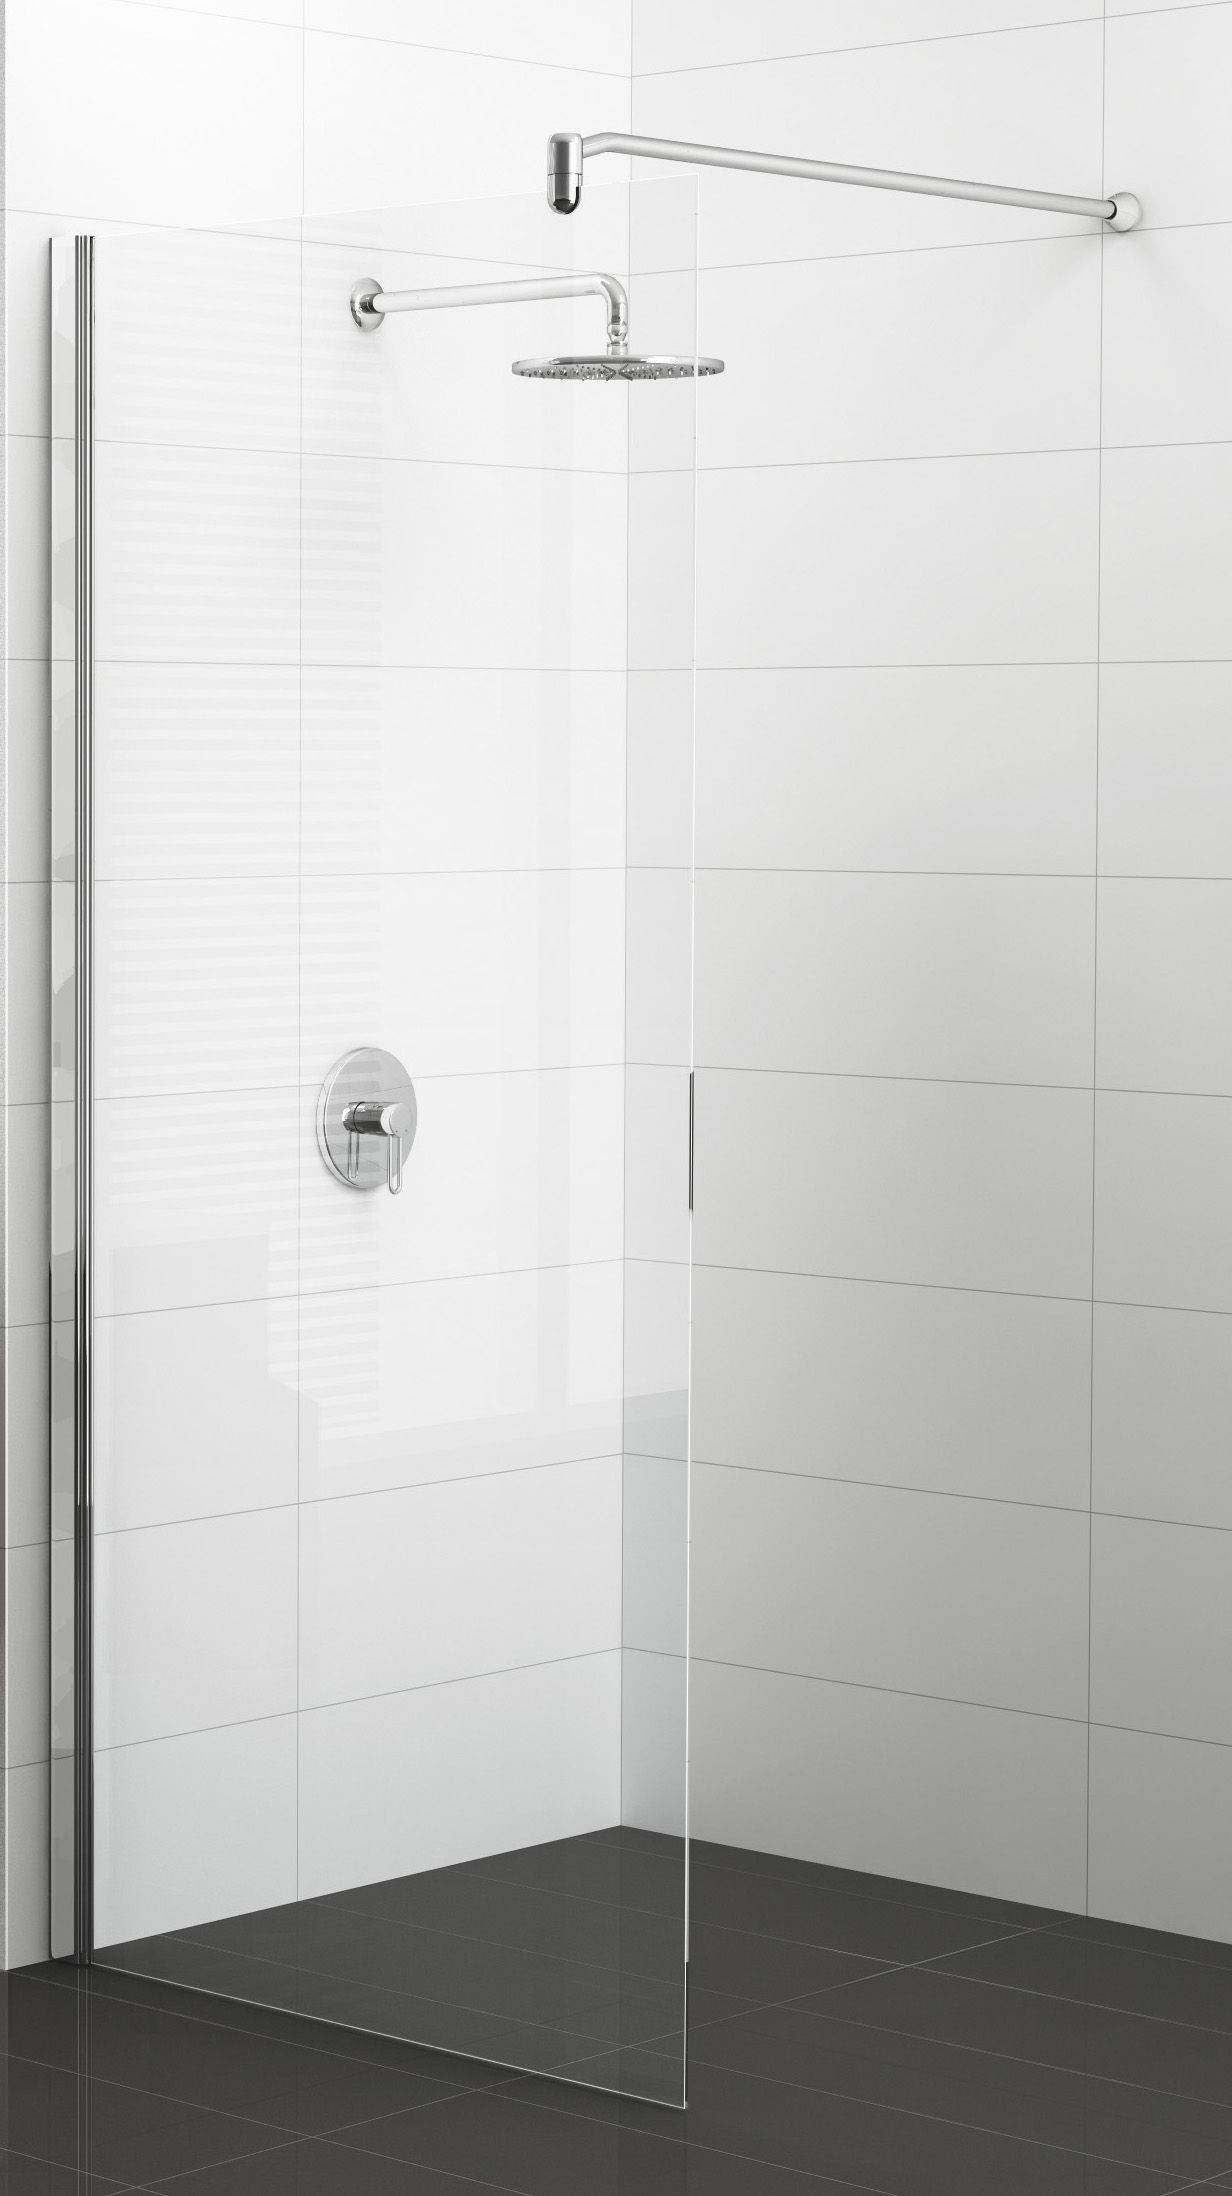 paroi de douche fixe adesio verre paisseur 6 mm